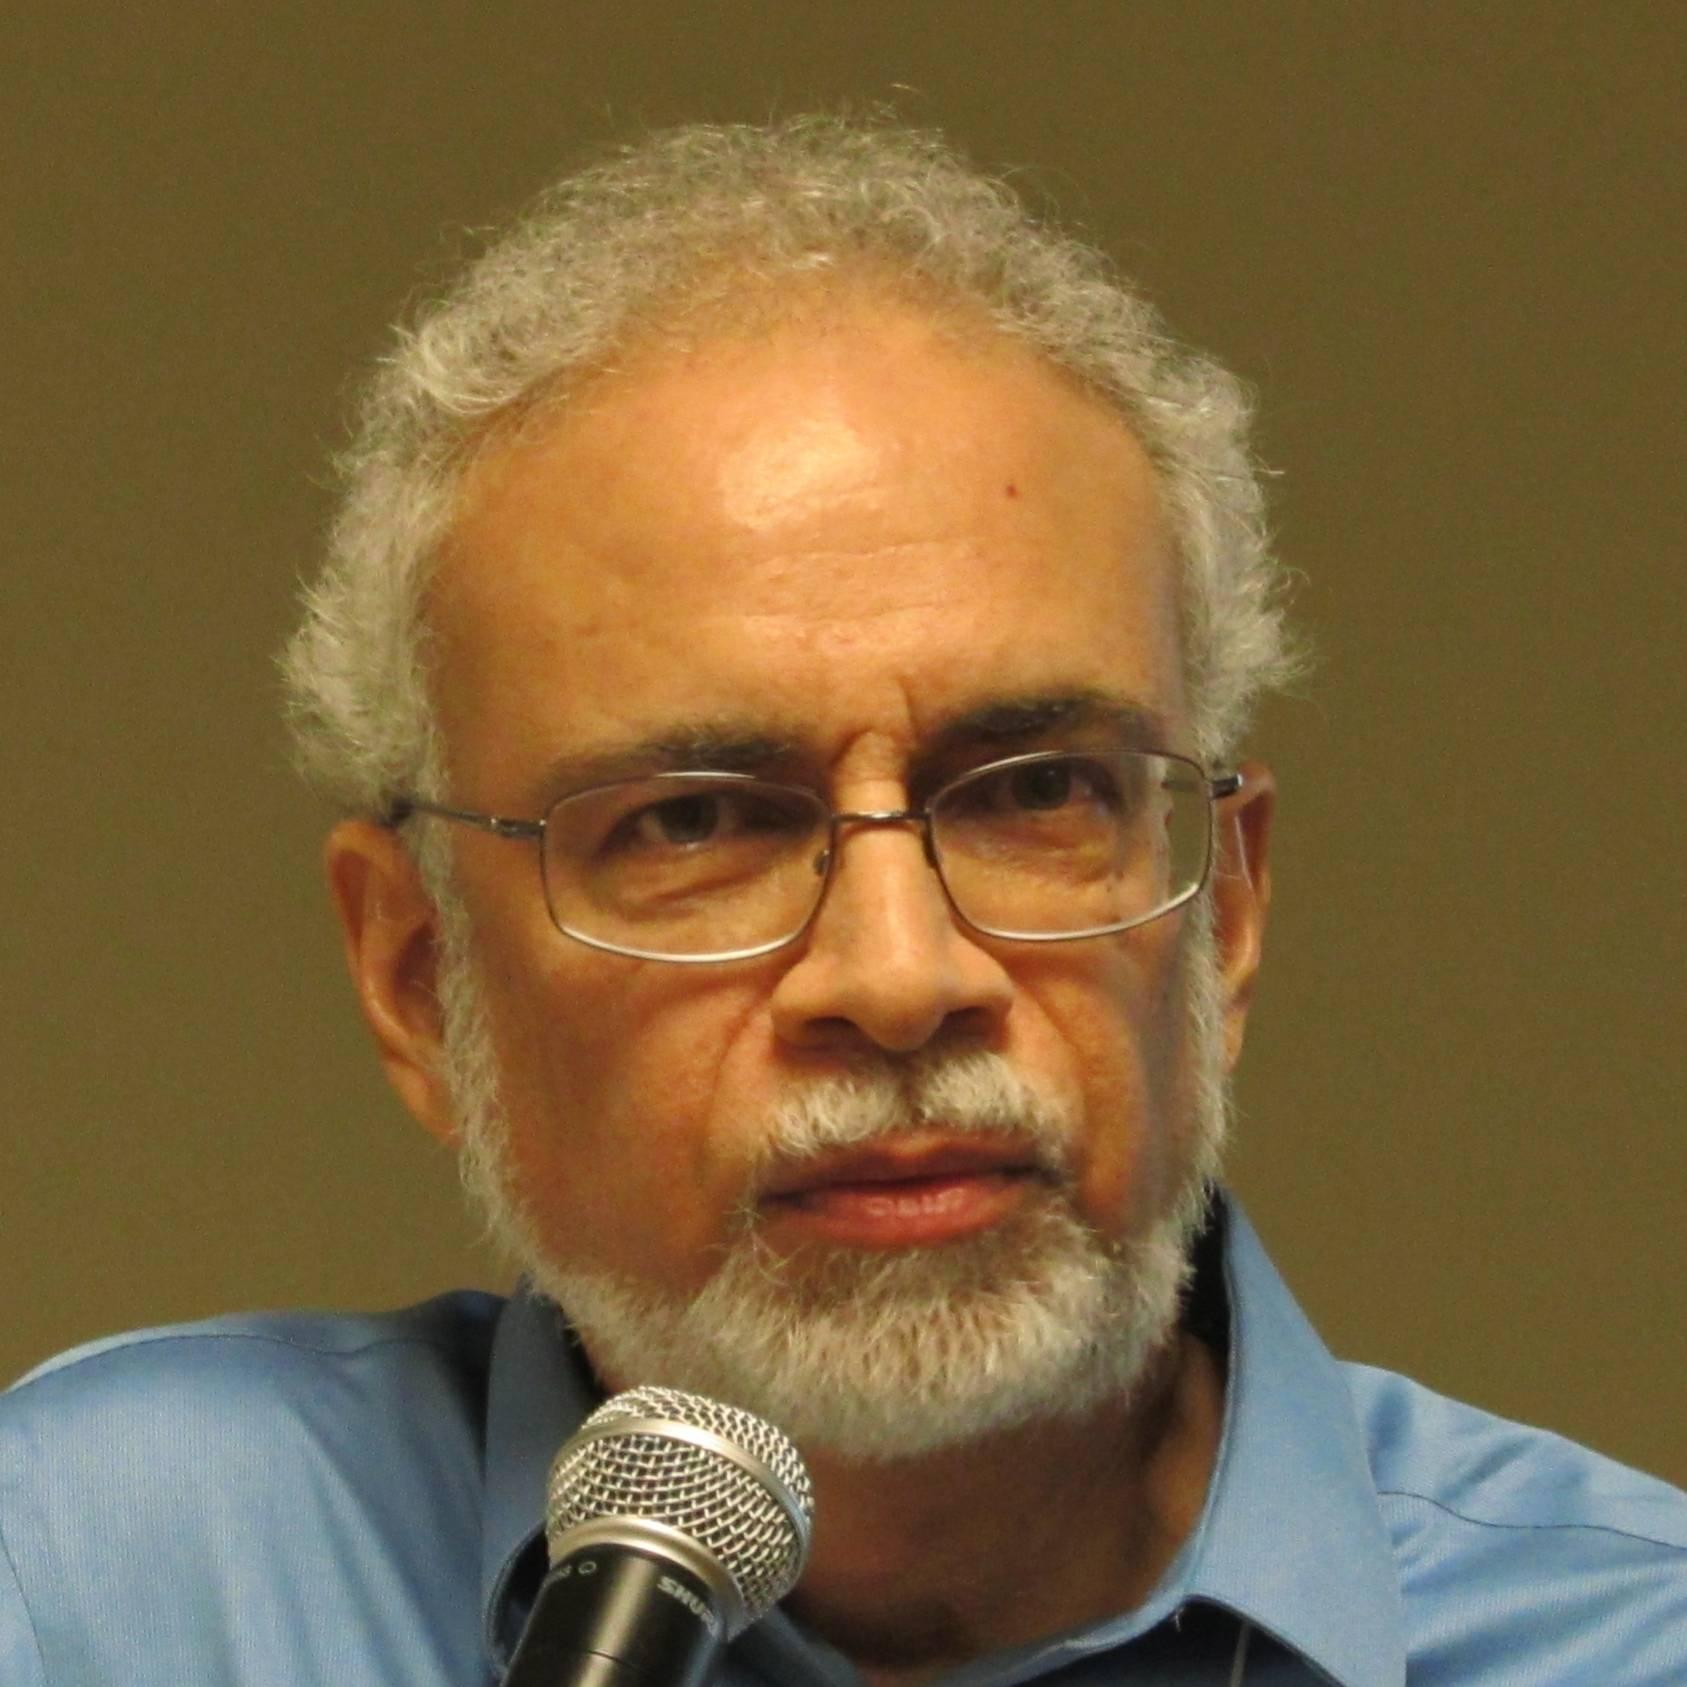 Get writing tips at Jewish Genealogical Society meeting